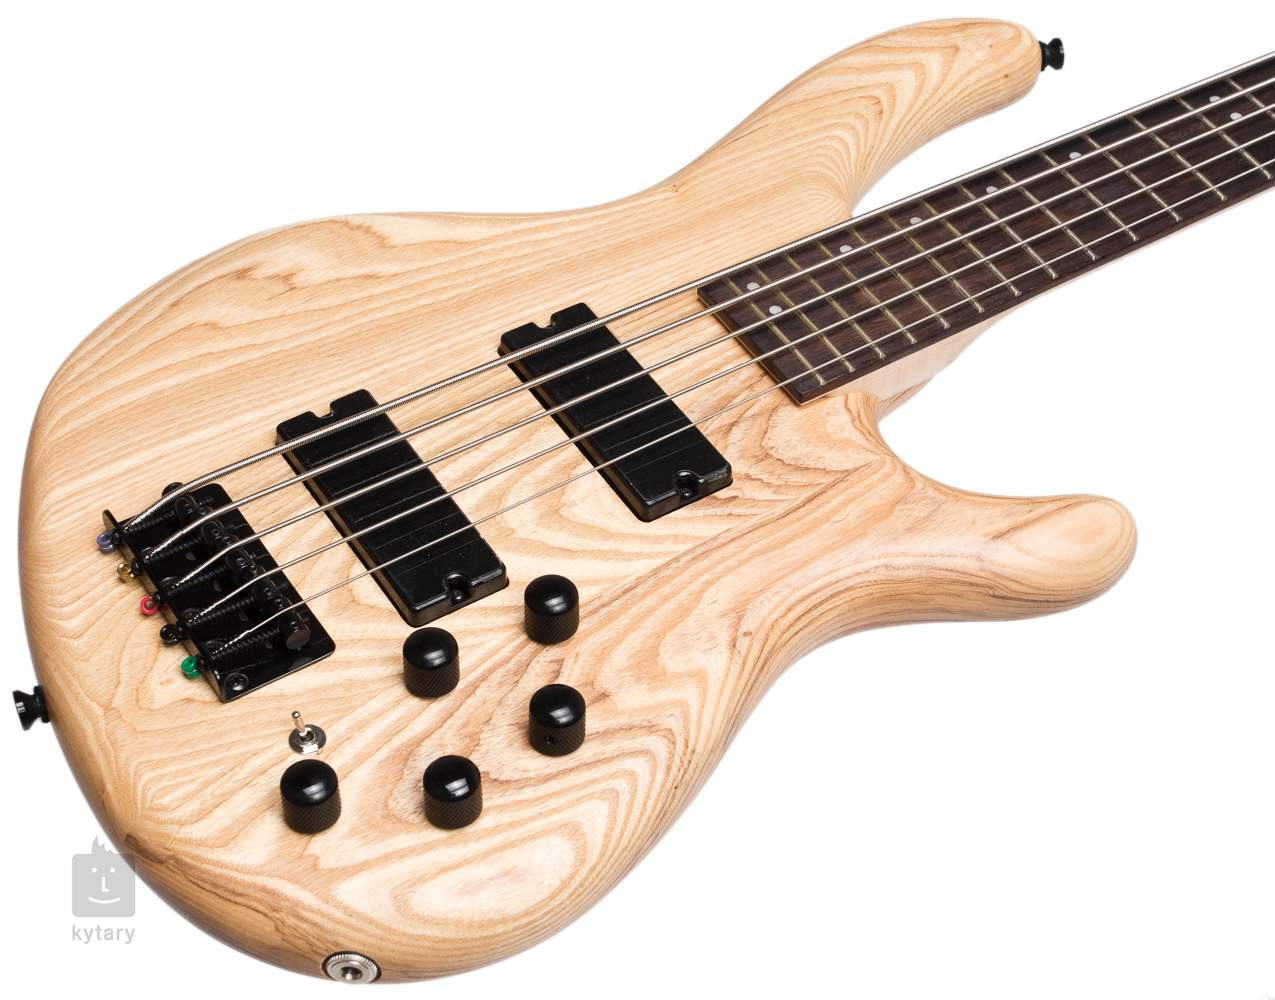 cort action dlx v as opn electric bass guitar. Black Bedroom Furniture Sets. Home Design Ideas